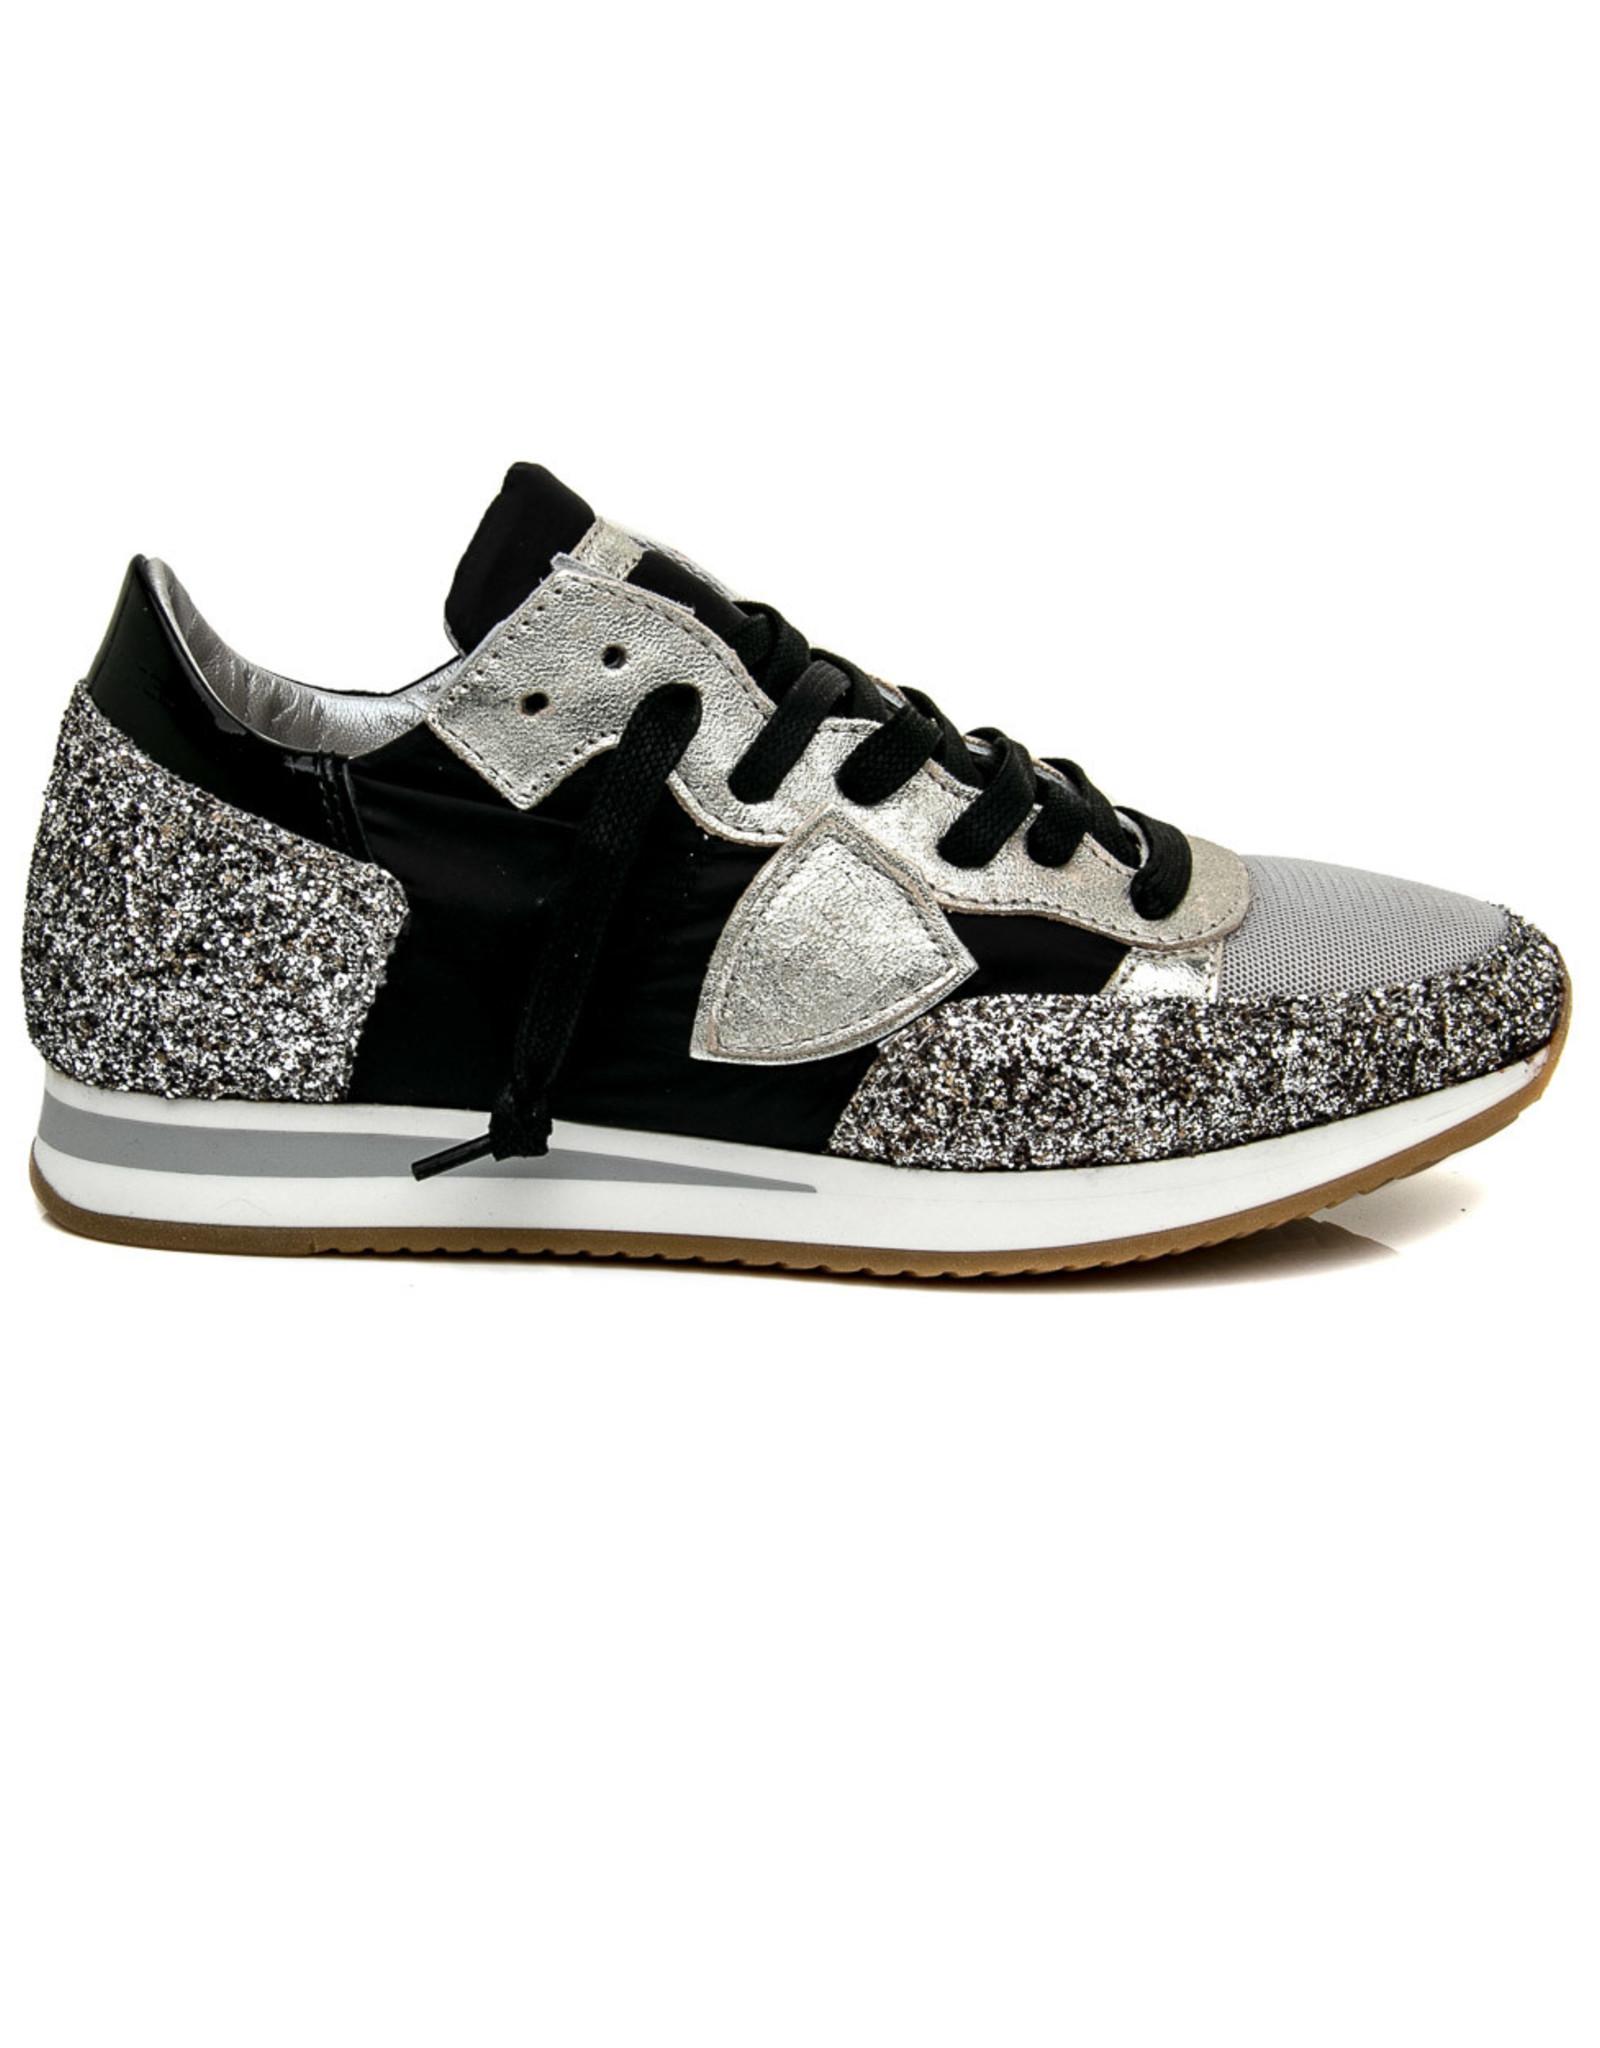 PHILIPPE MODEL - The Tropez Sneaker